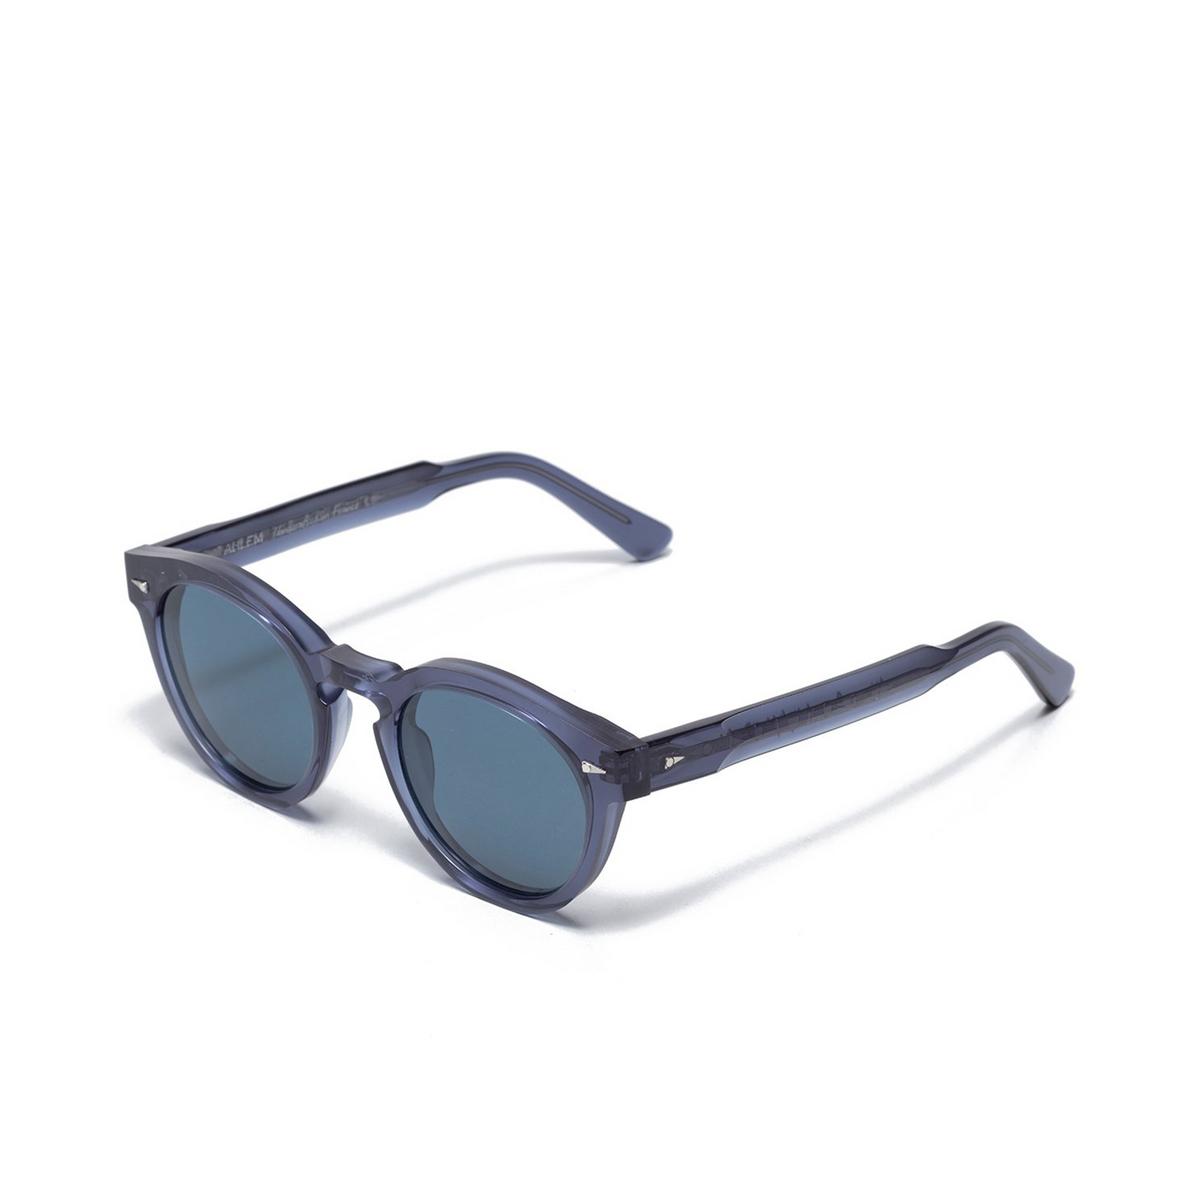 Ahlem® Round Sunglasses: Abbesses color Indigolight.